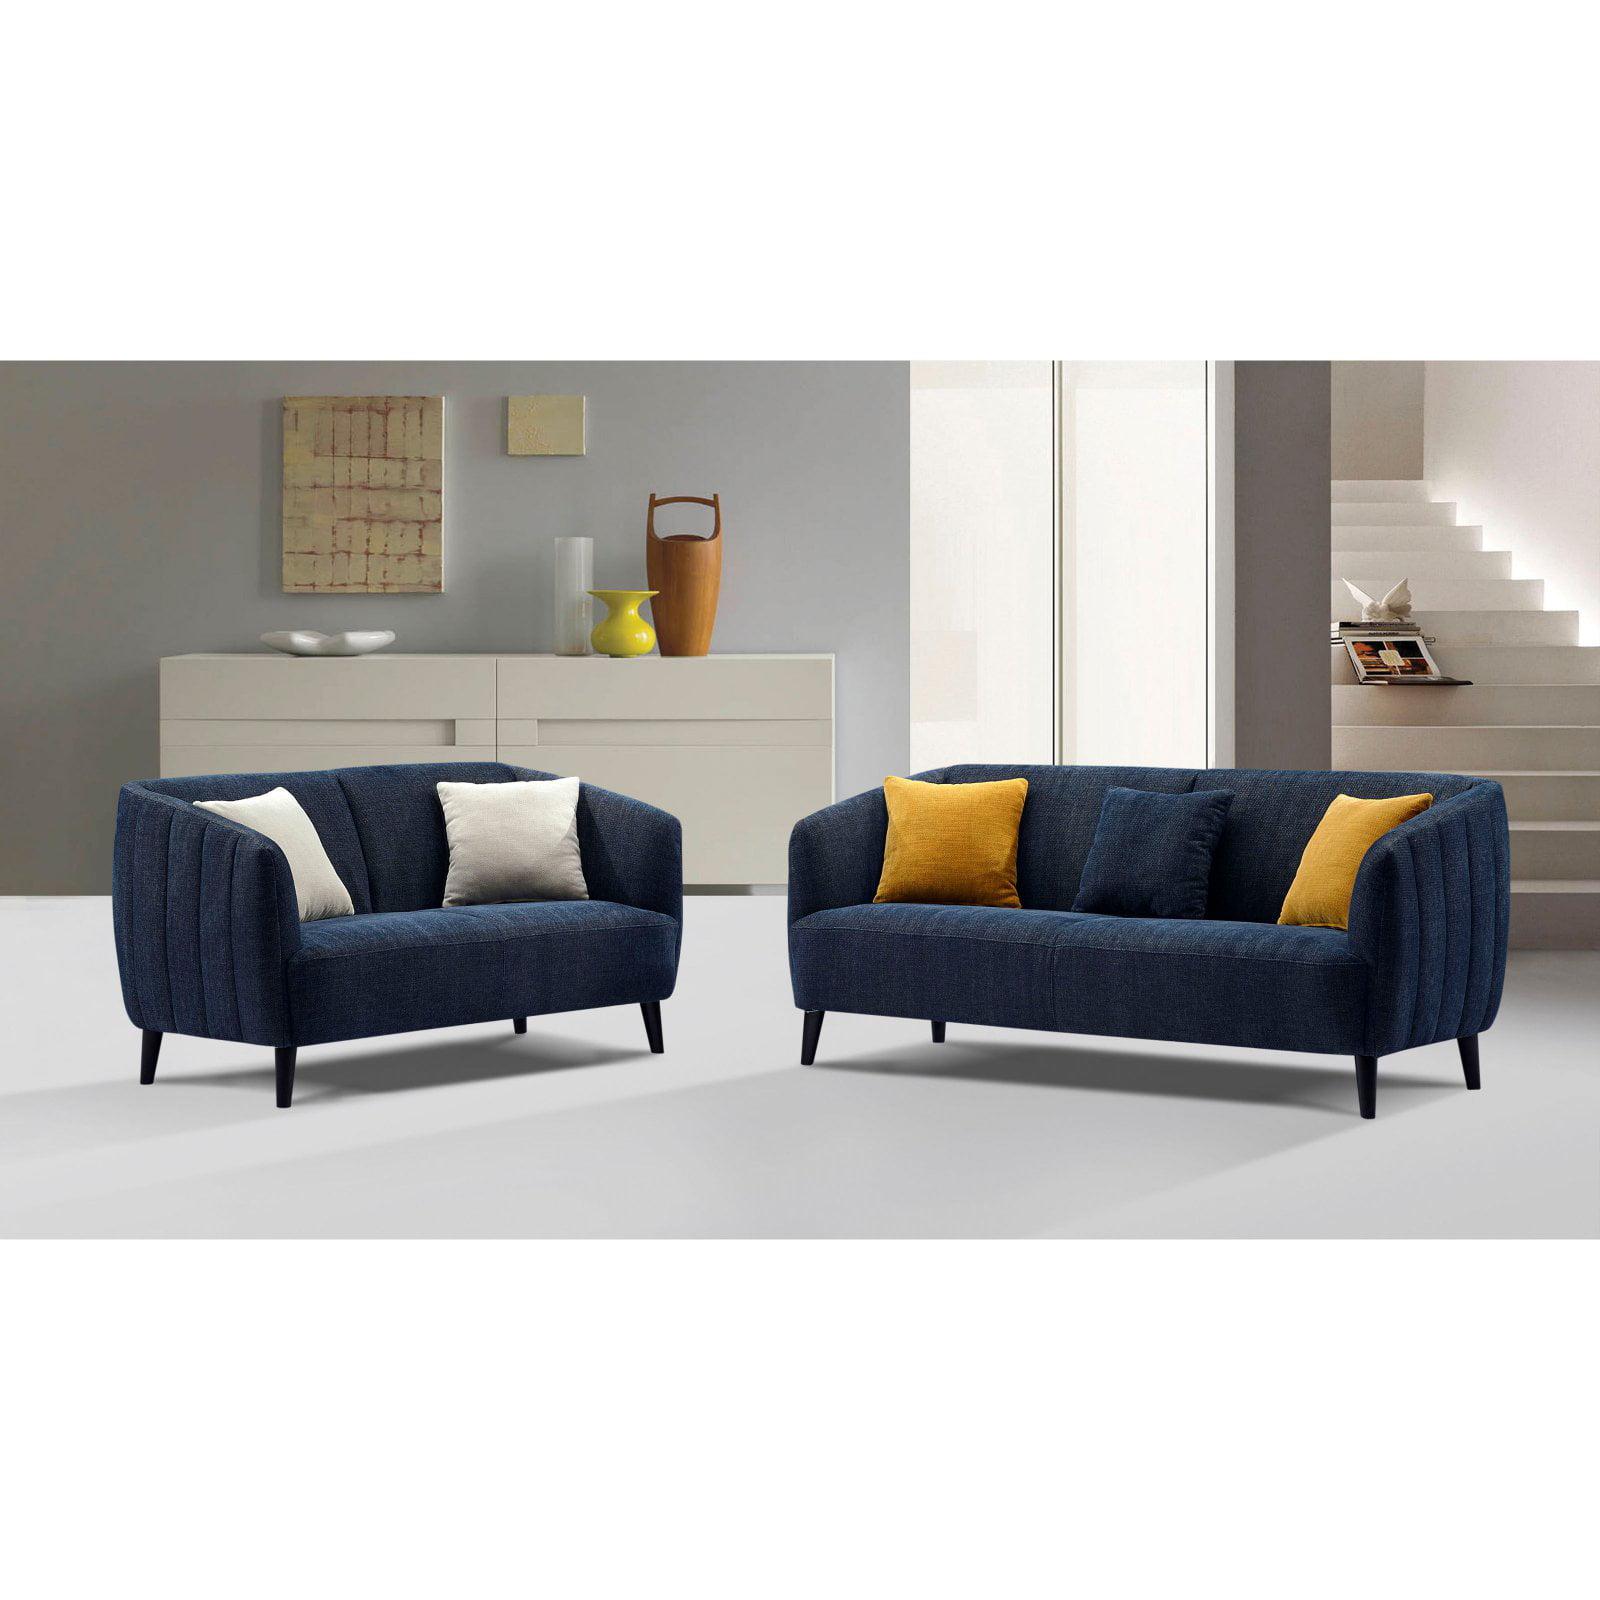 Diamond Sofa DeLuca Fabric Sofa and Loveseat Set - Midnight Blue